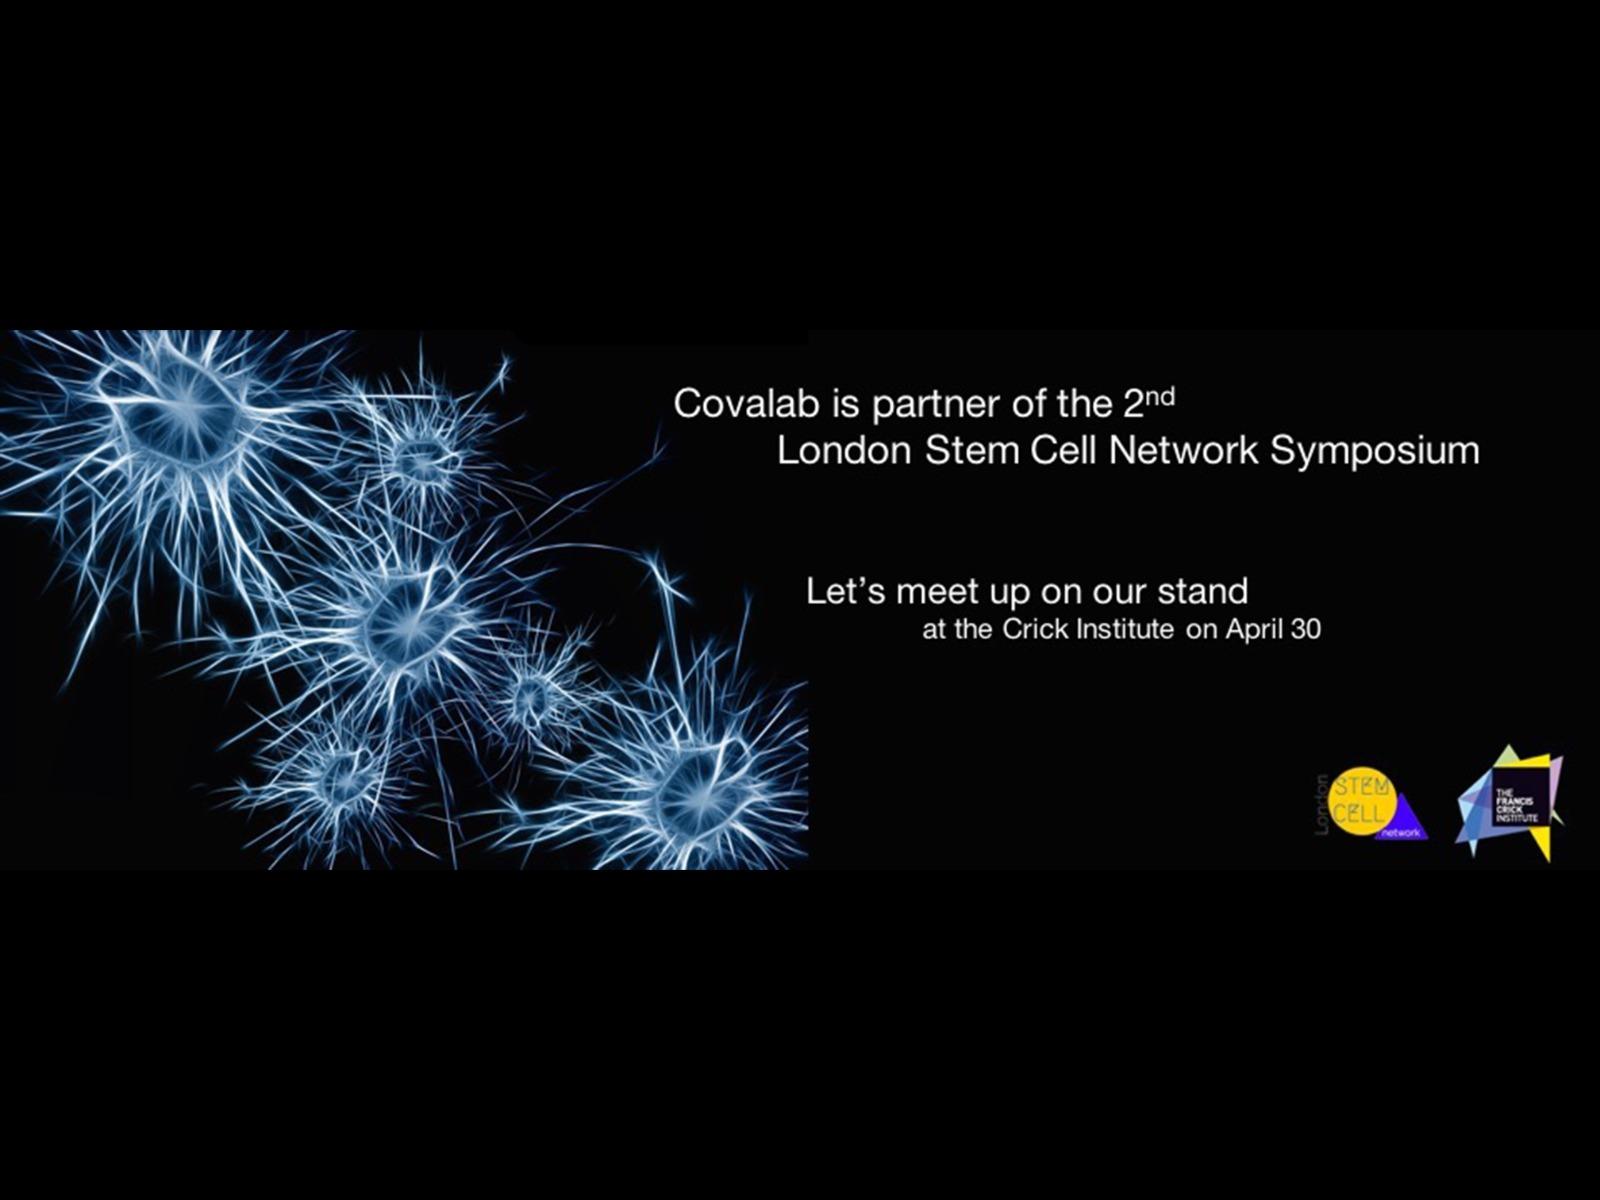 London stem cell network symposium